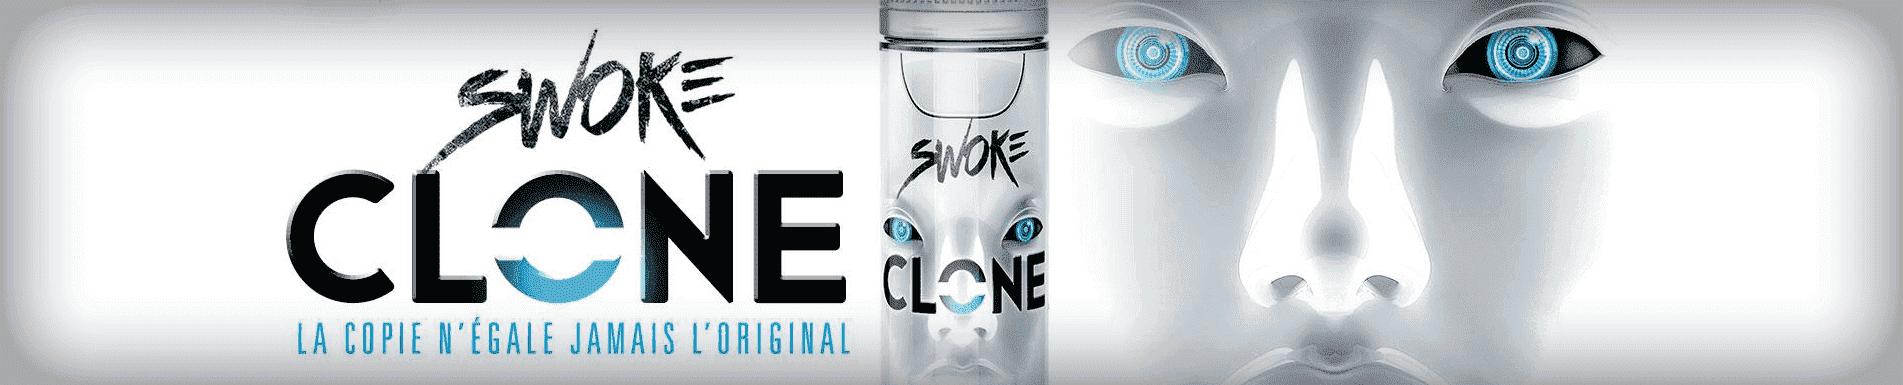 E-liquide Clone 10 mL par Swoke